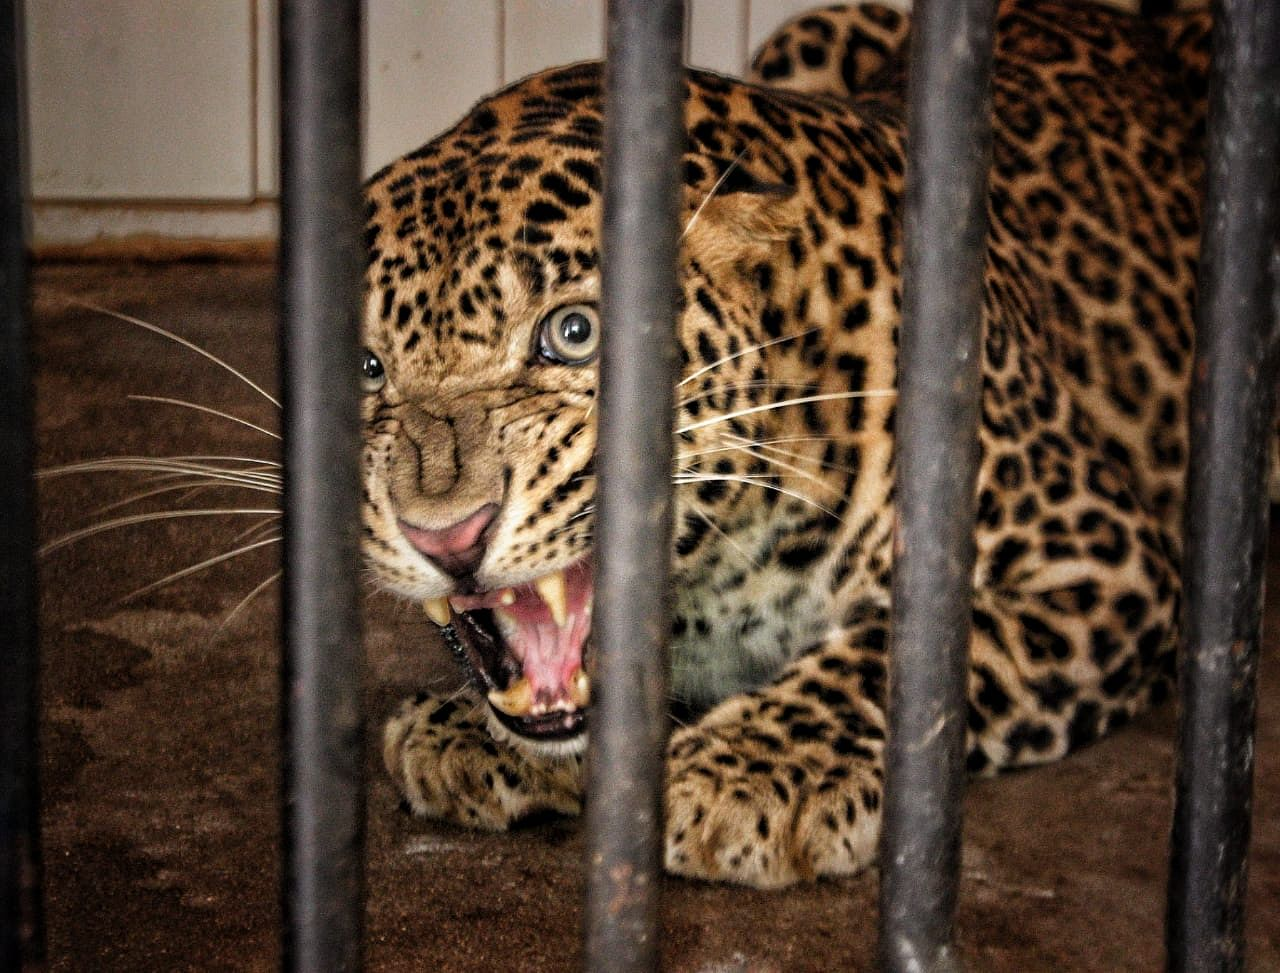 Andhra pradesh veterinarian risks life rescue wildlife inspiring india